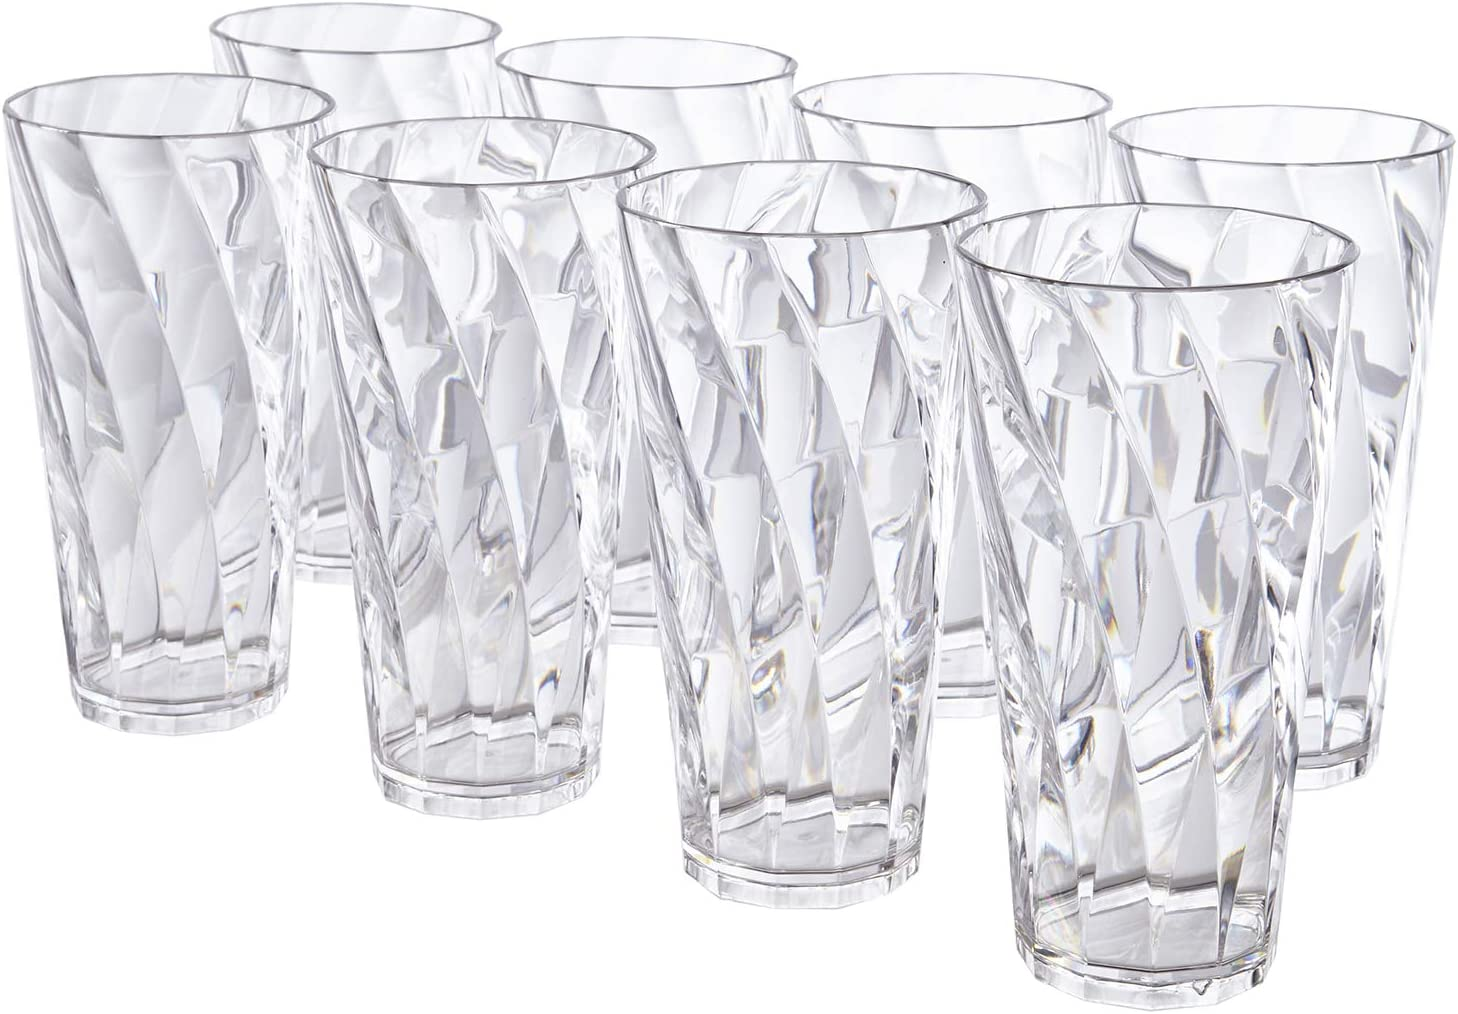 Optix 26-ounce Clear Plastic Cups Set of 8